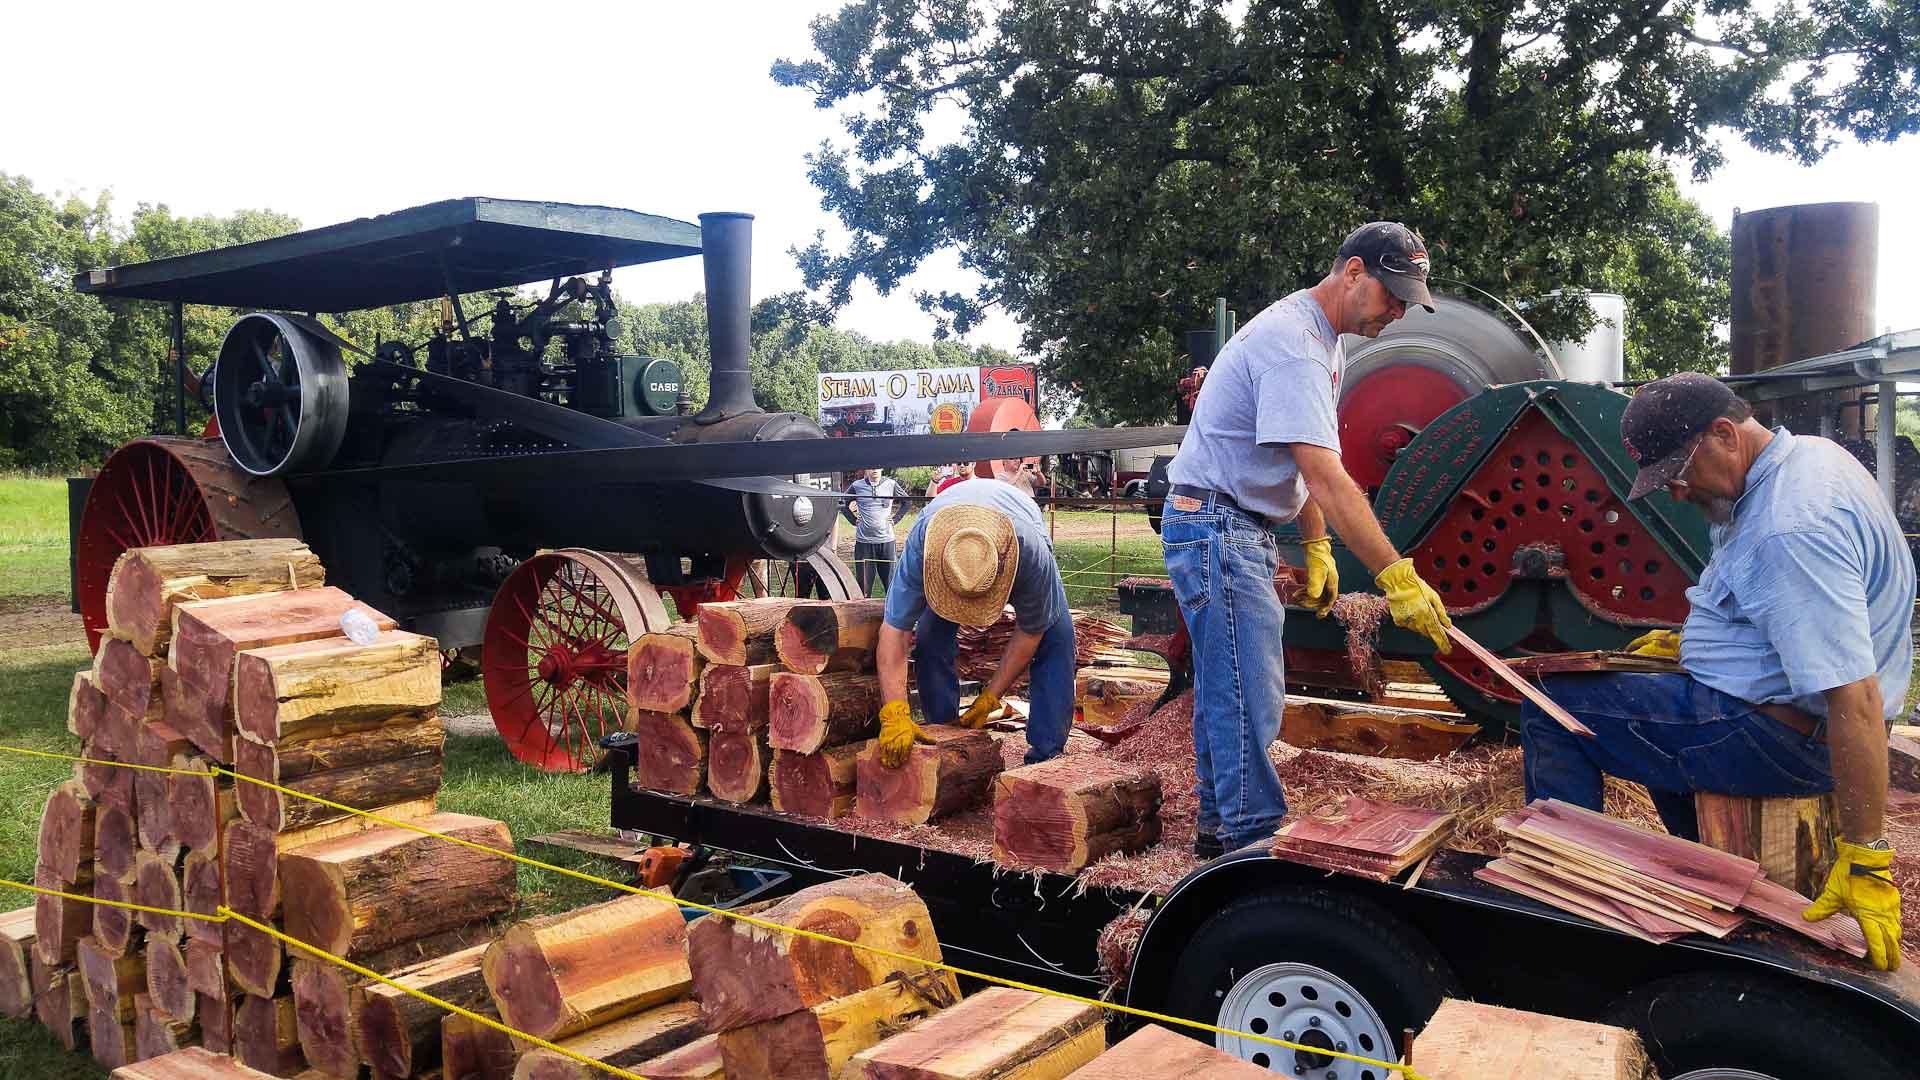 The Ozark Steam Engine Association cutting cedar shingles using a steam tractor.